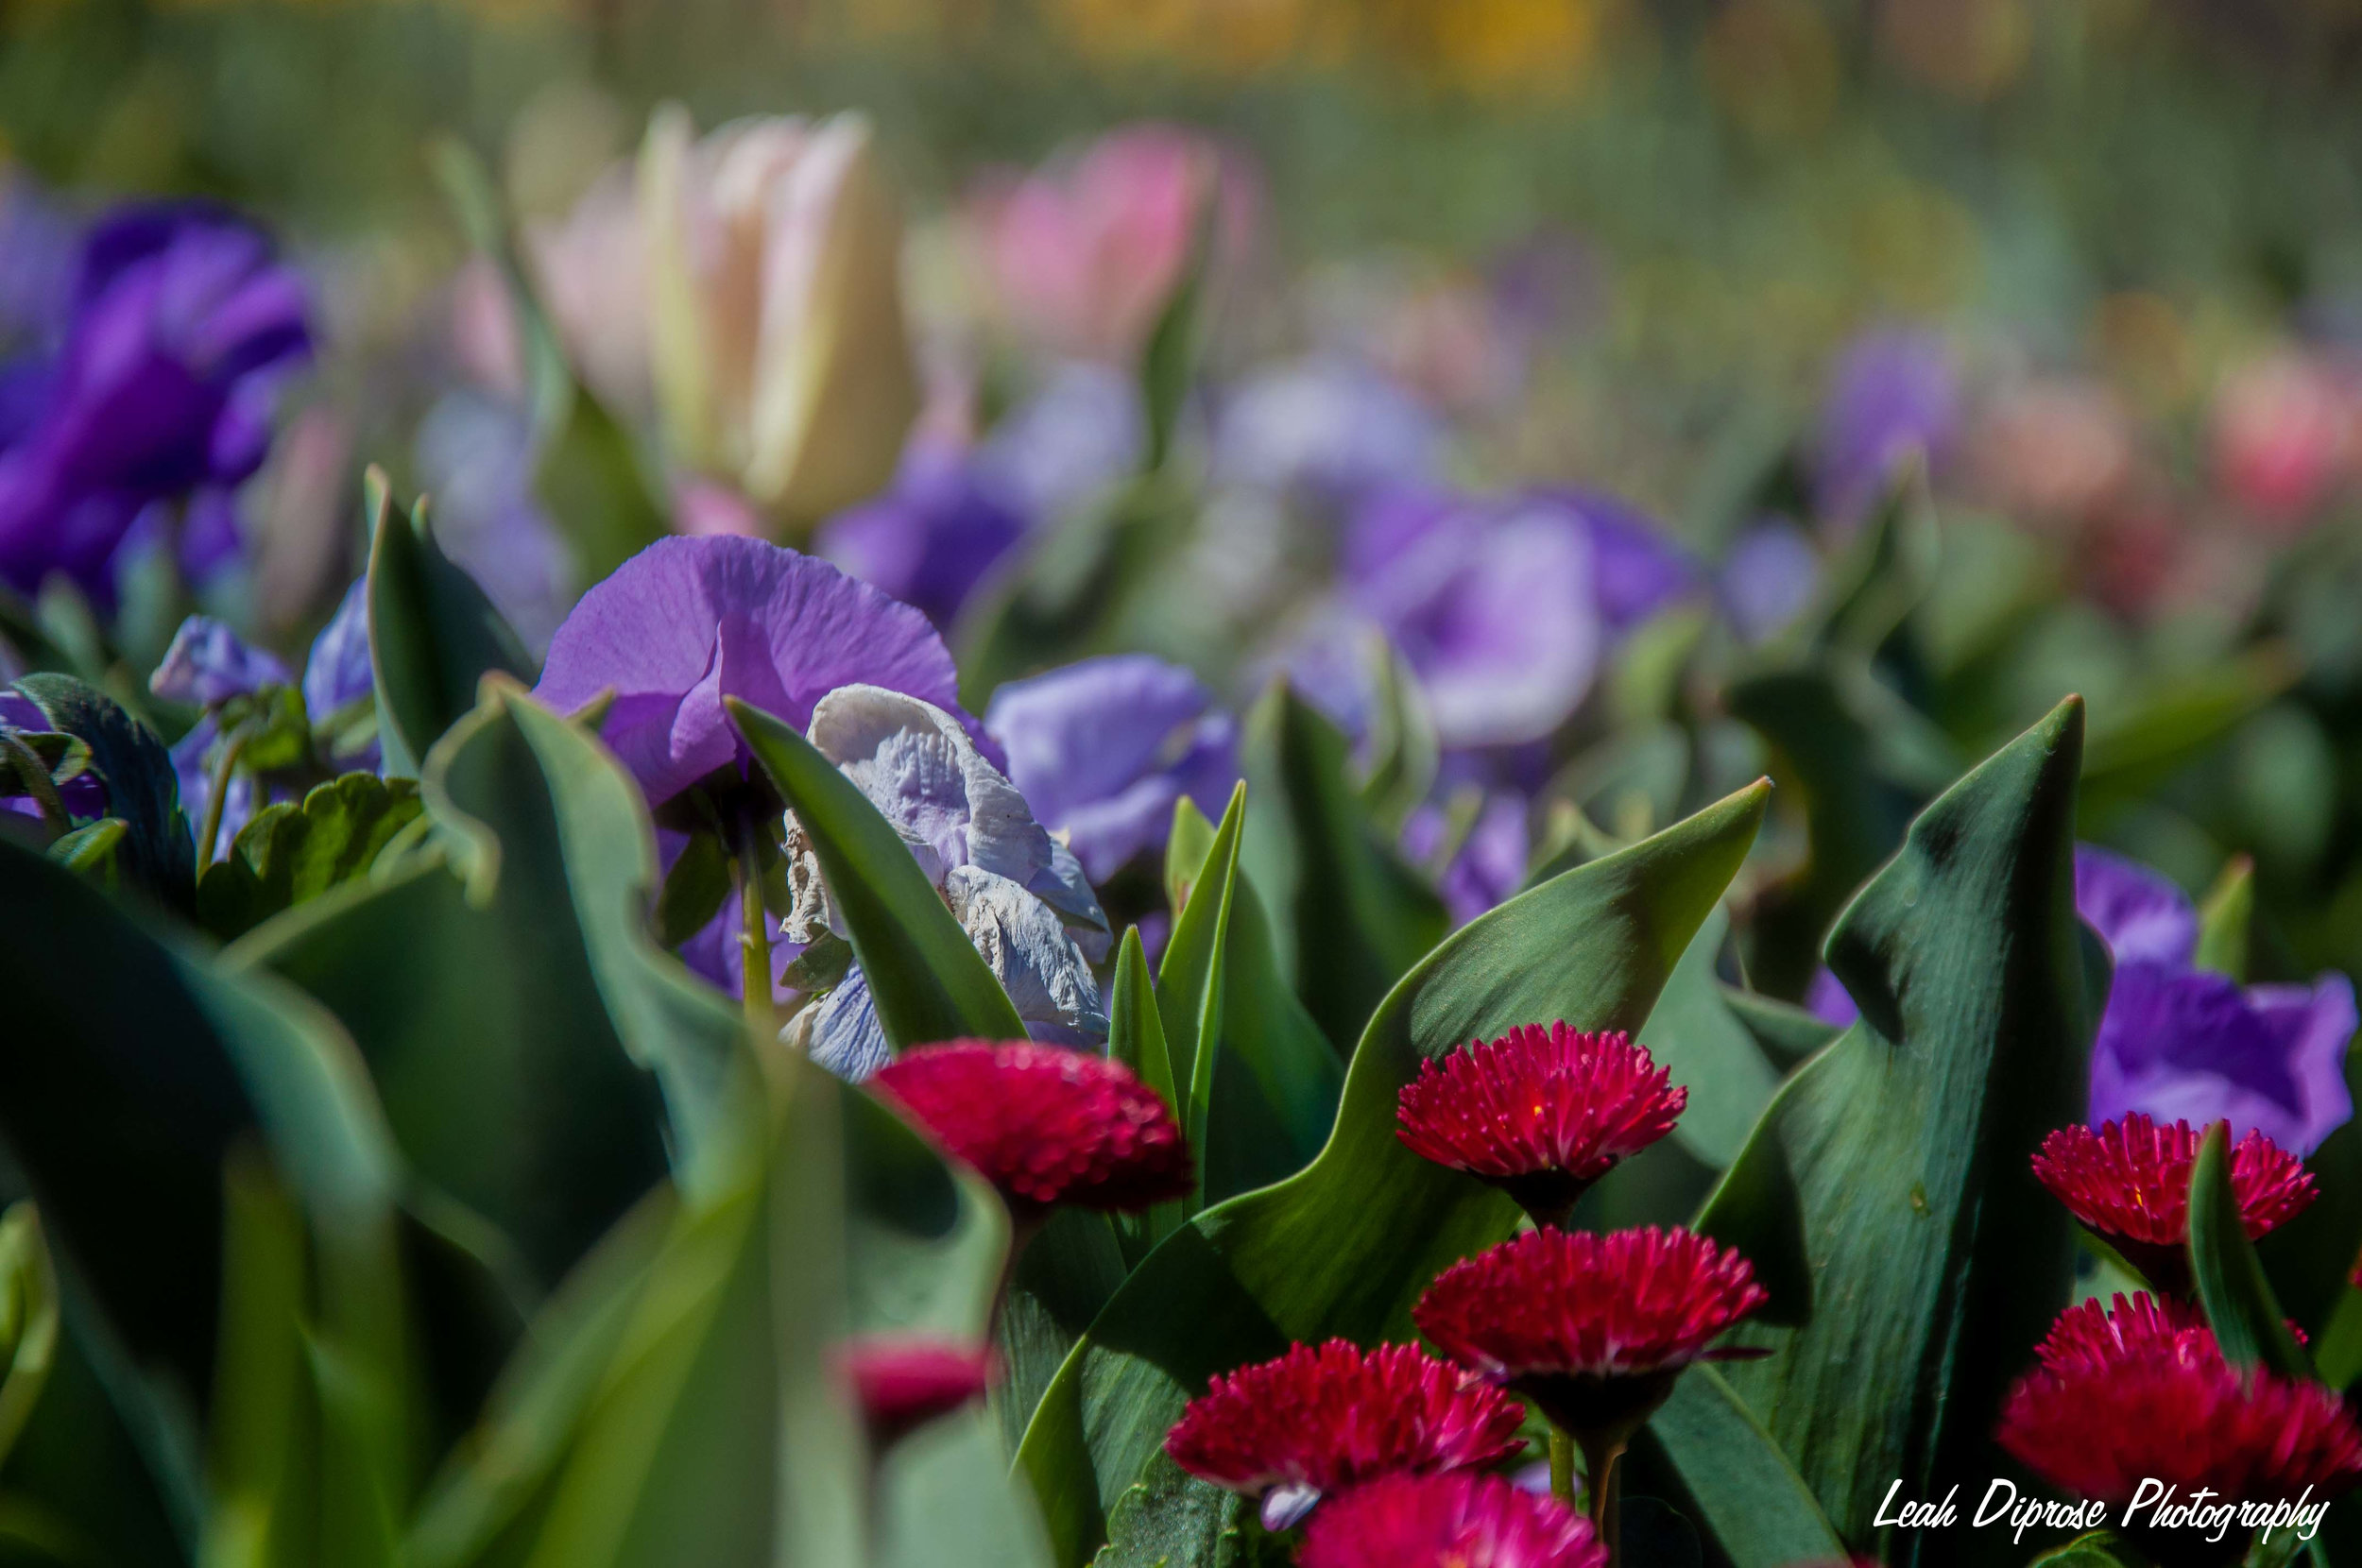 Leah Diprose Photography image-5920.jpg